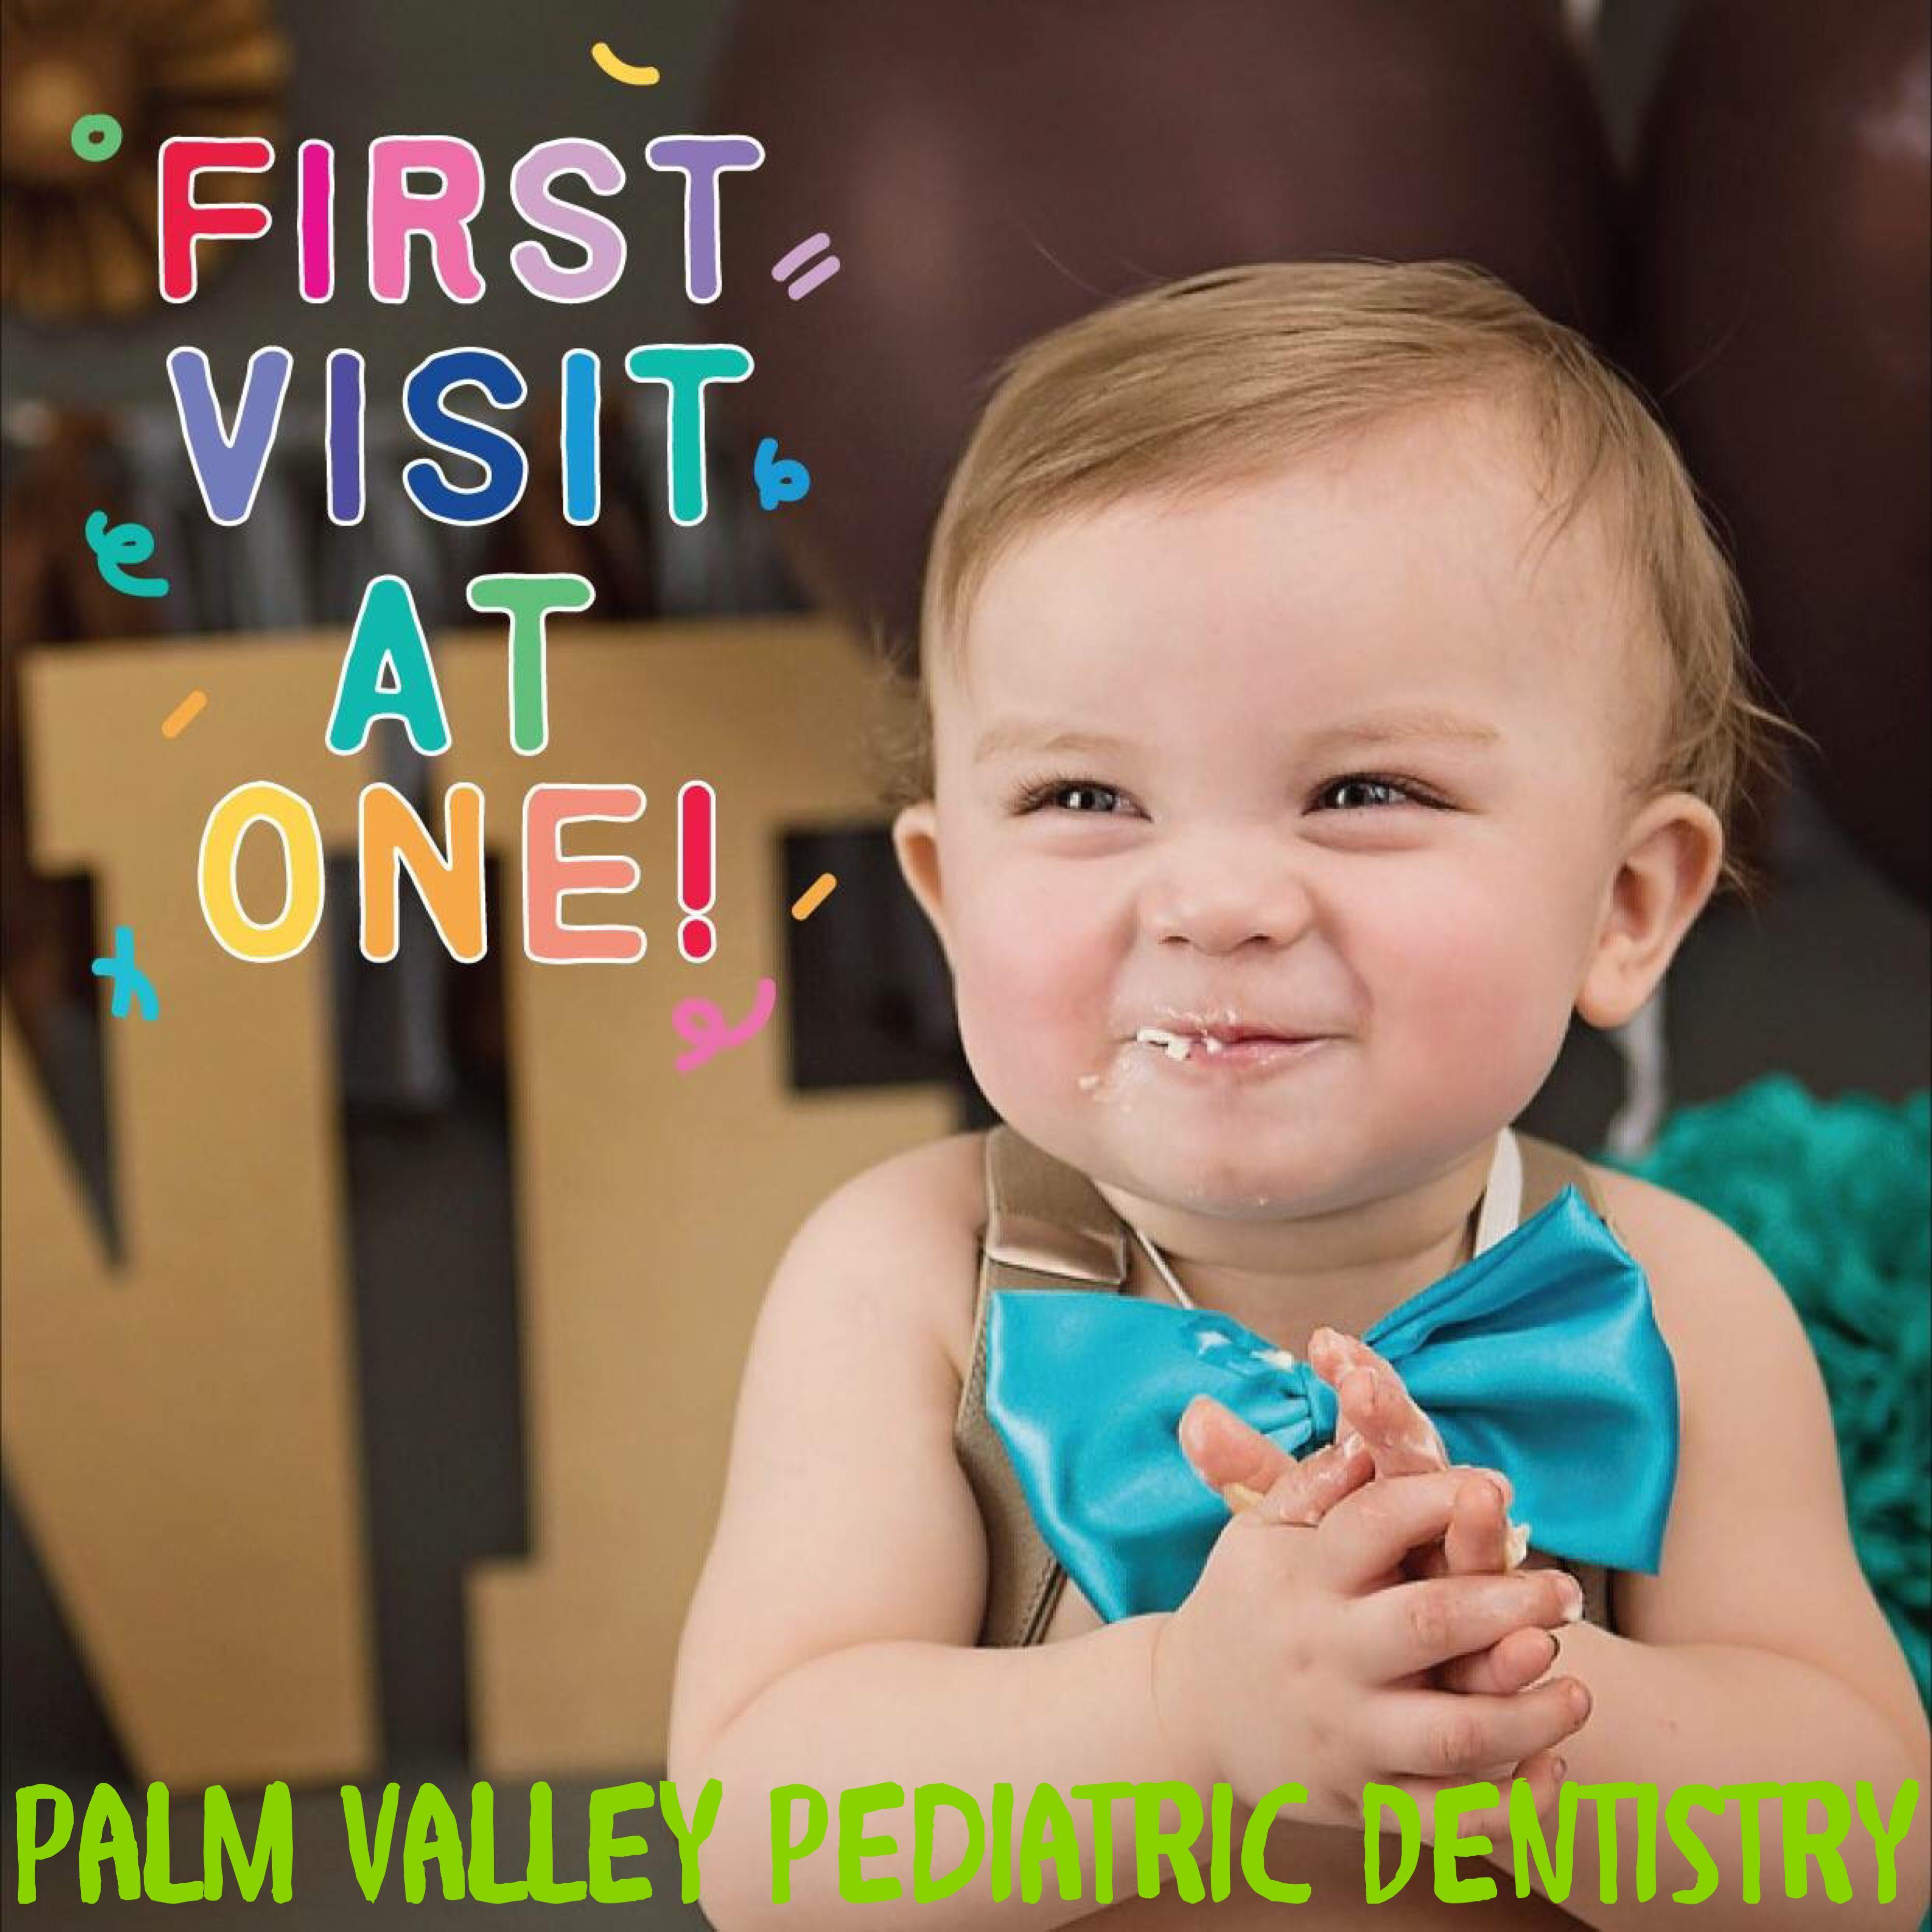 Pin by palm valley pediatric dentistr on palm valley